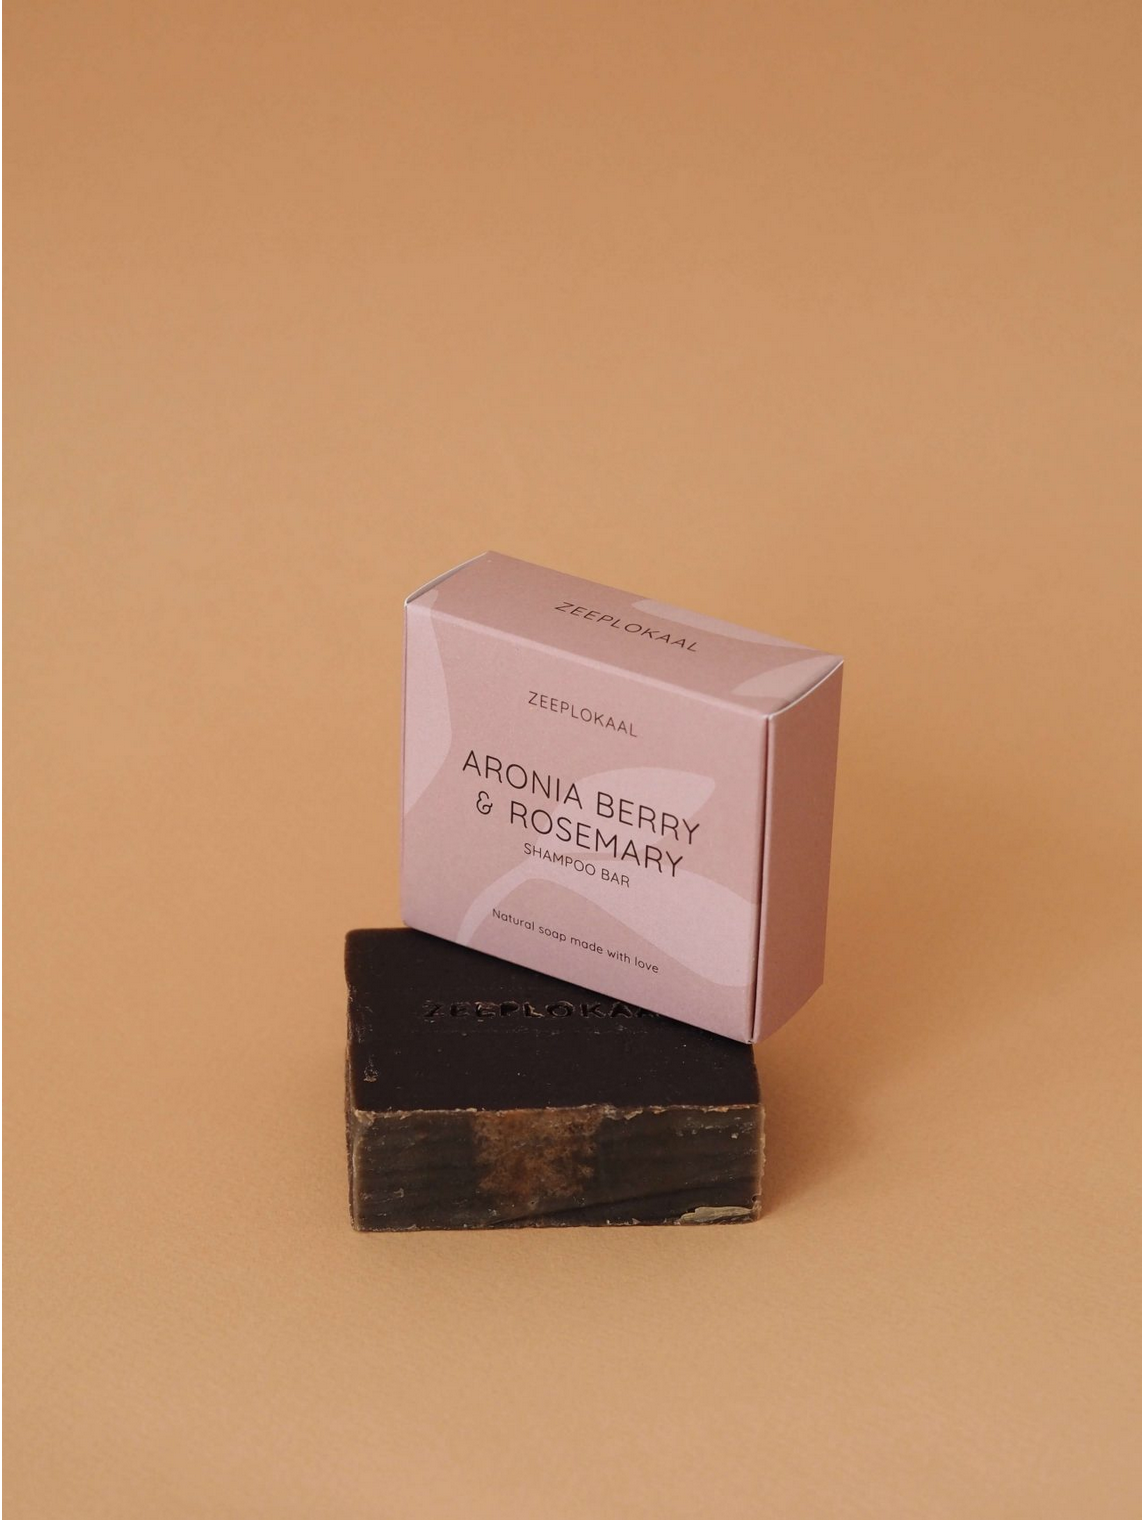 Shampoo Bar - Aroniabes & Rozemarijn - Zeeplokaal-2